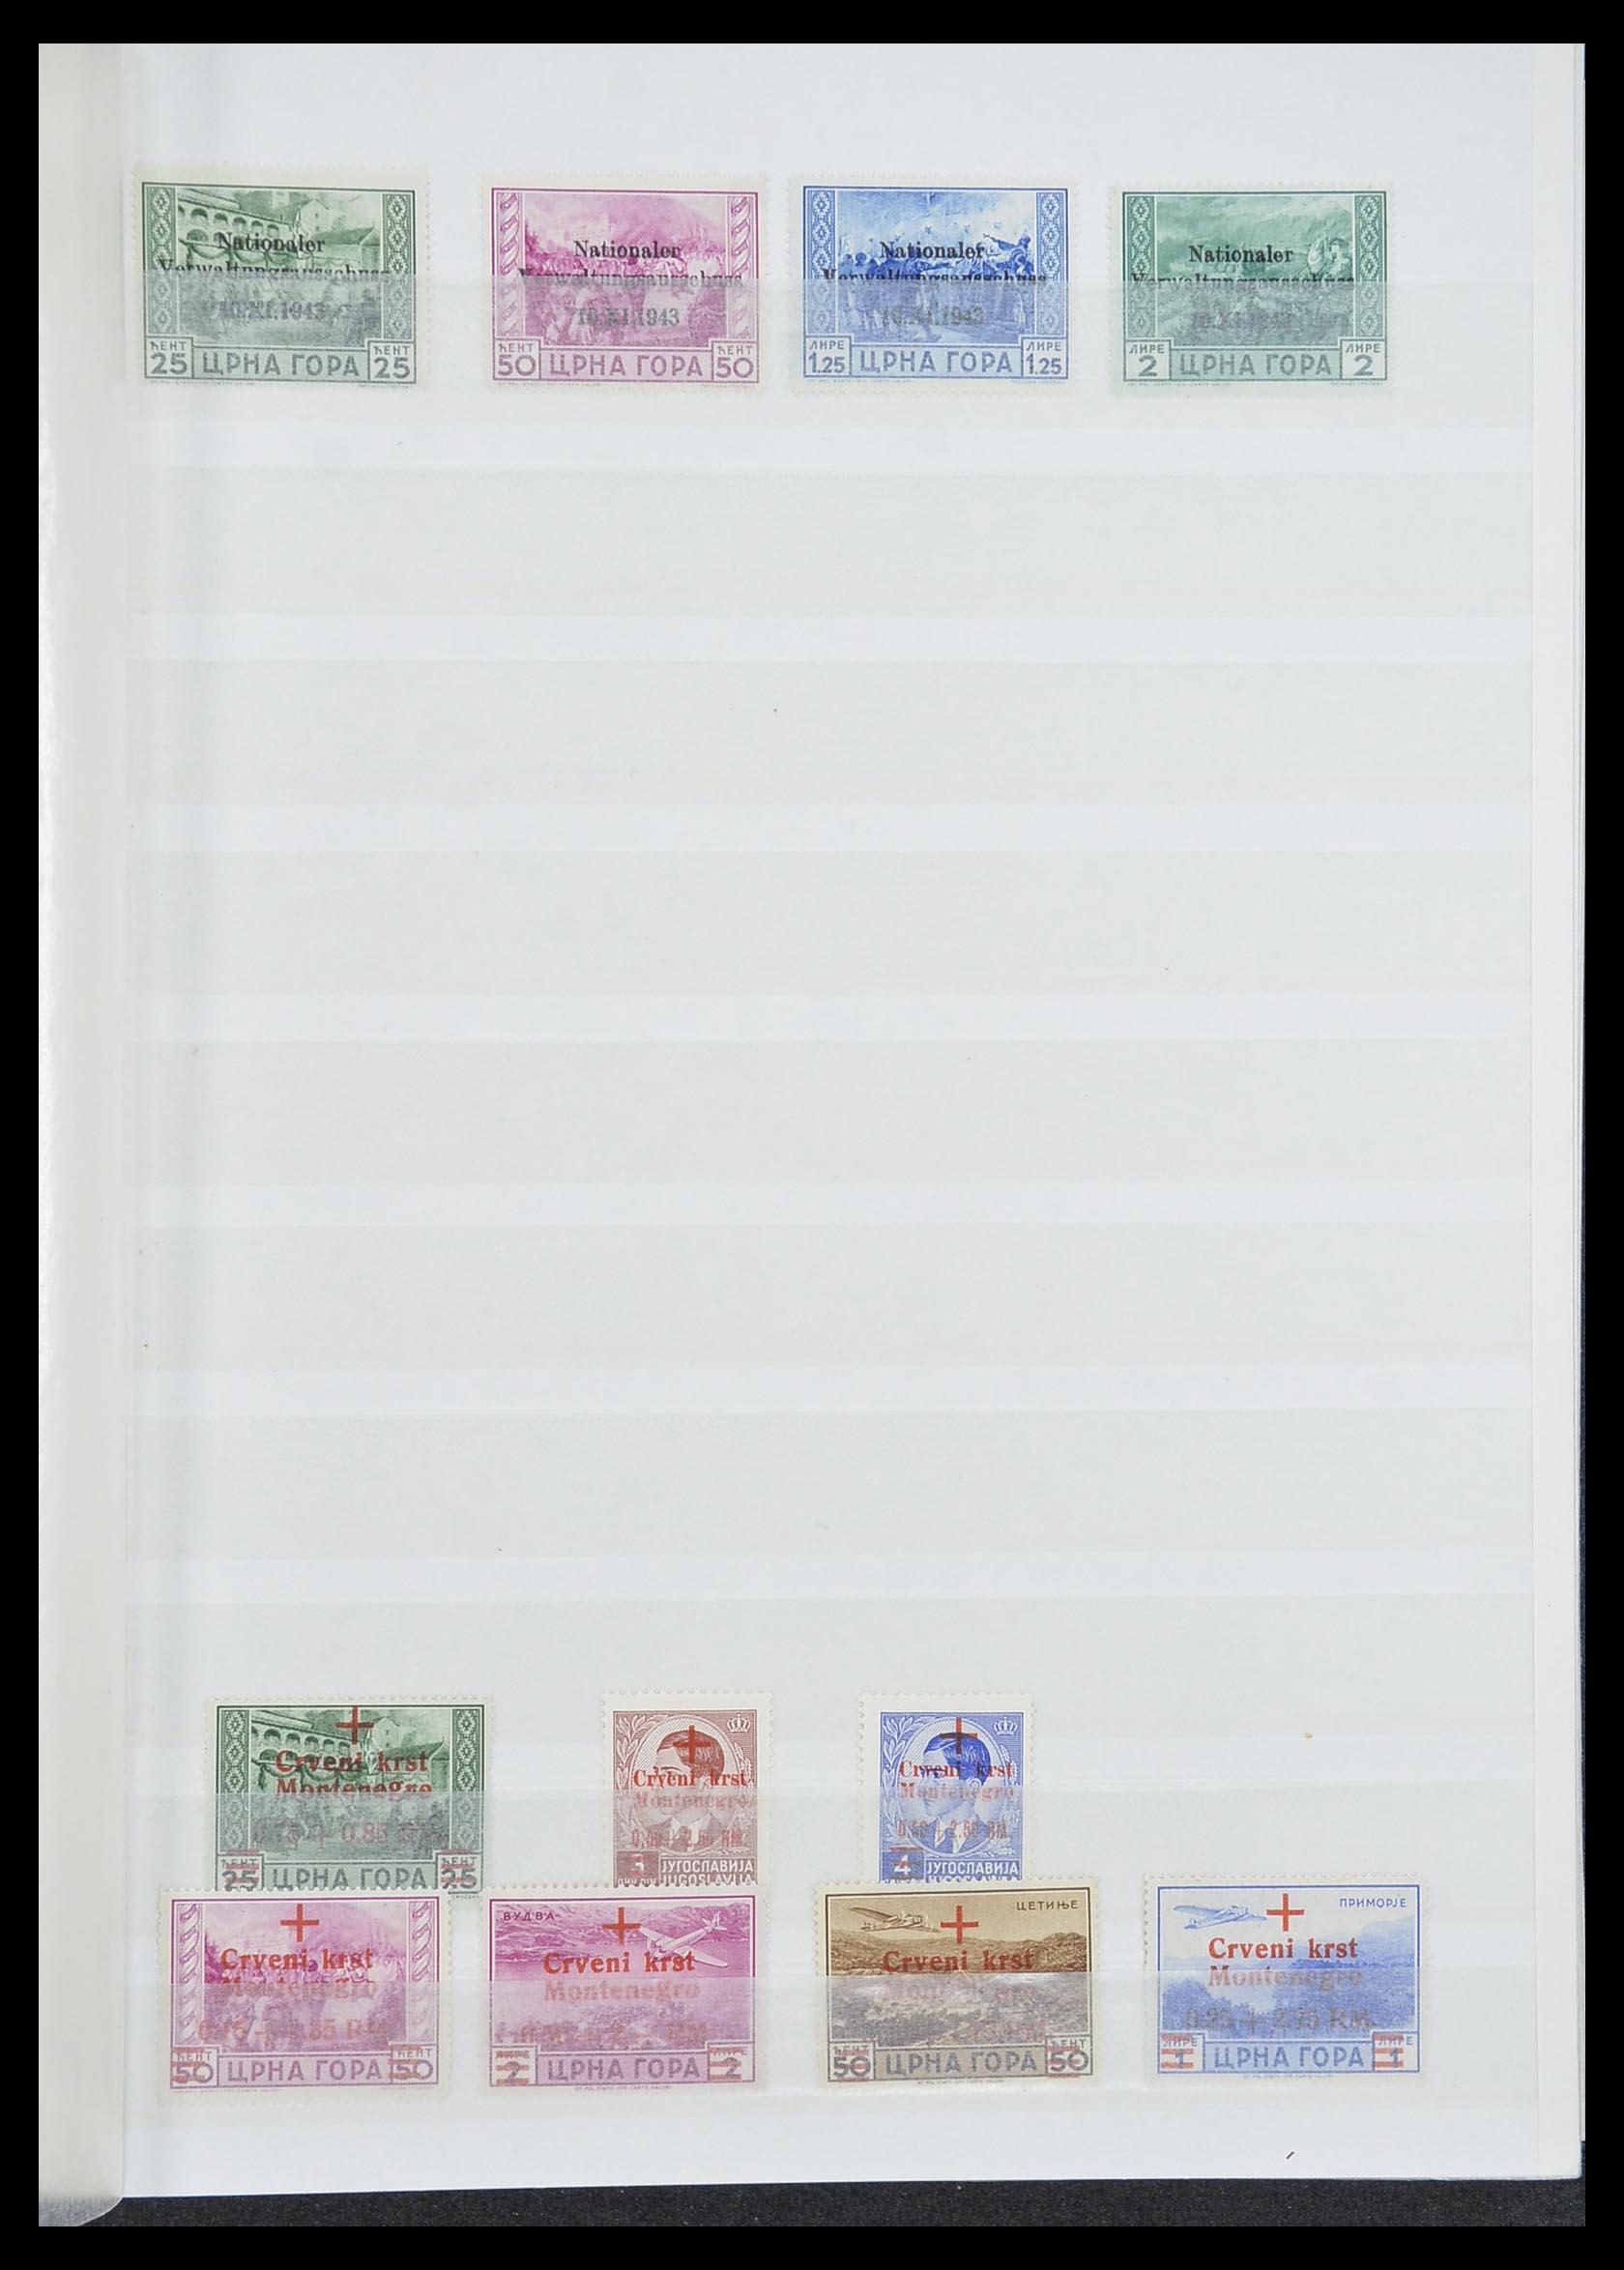 33850 007 - Postzegelverzameling 33850 Duitse bezettingen 2e wereldoorlog 1939-19